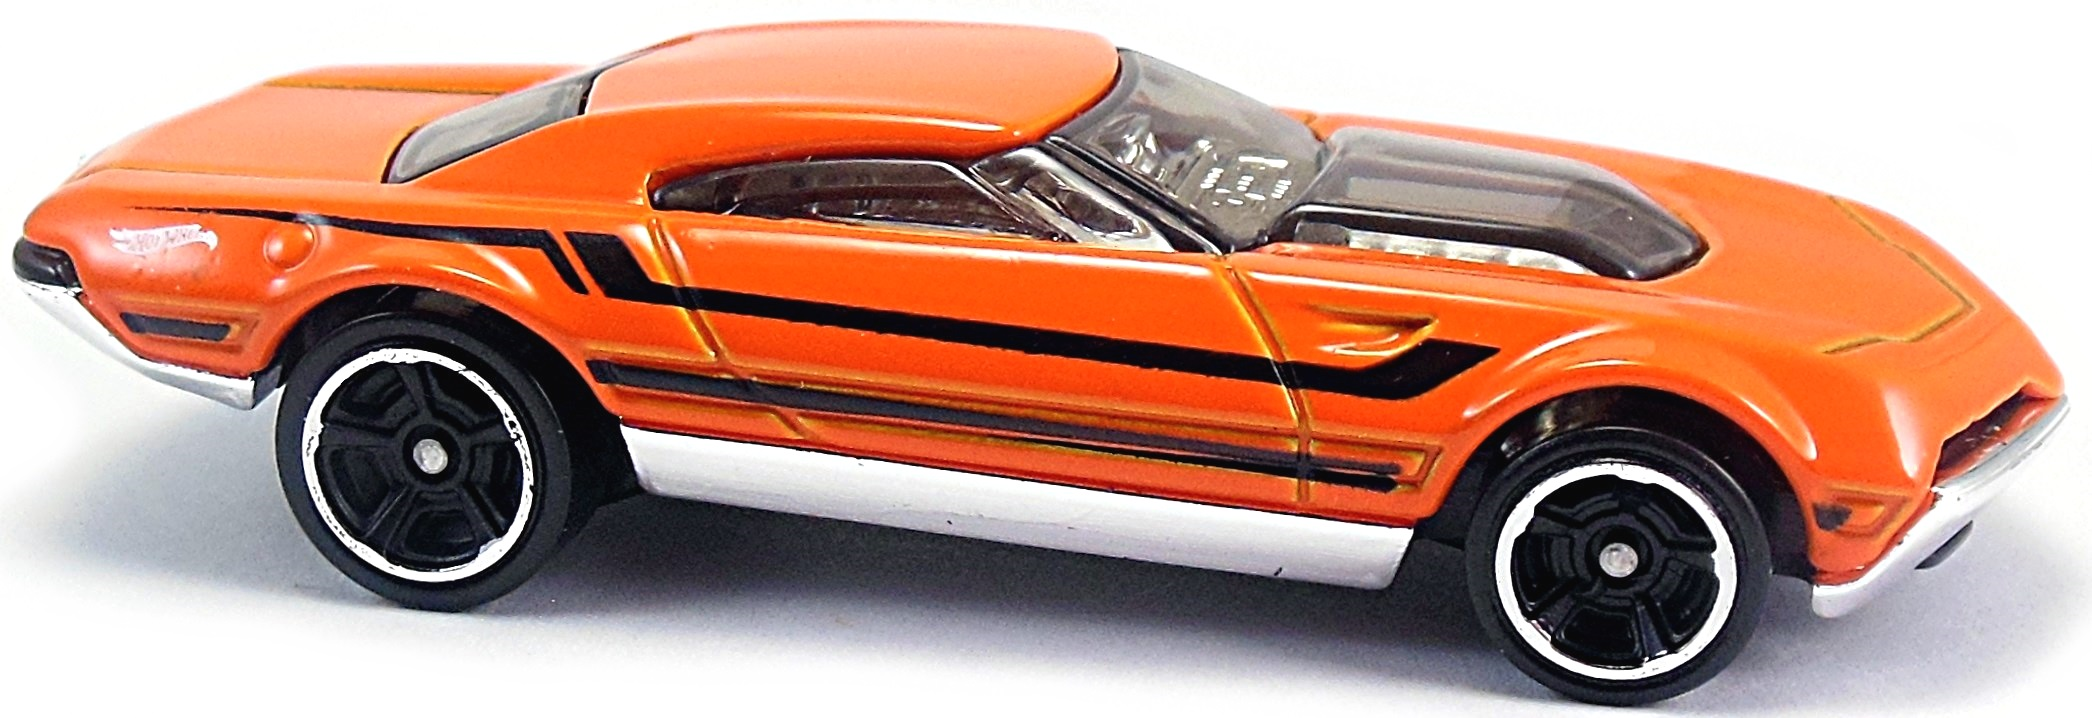 Muscle Speeder 80mm 2016 Hot Wheels Newsletter